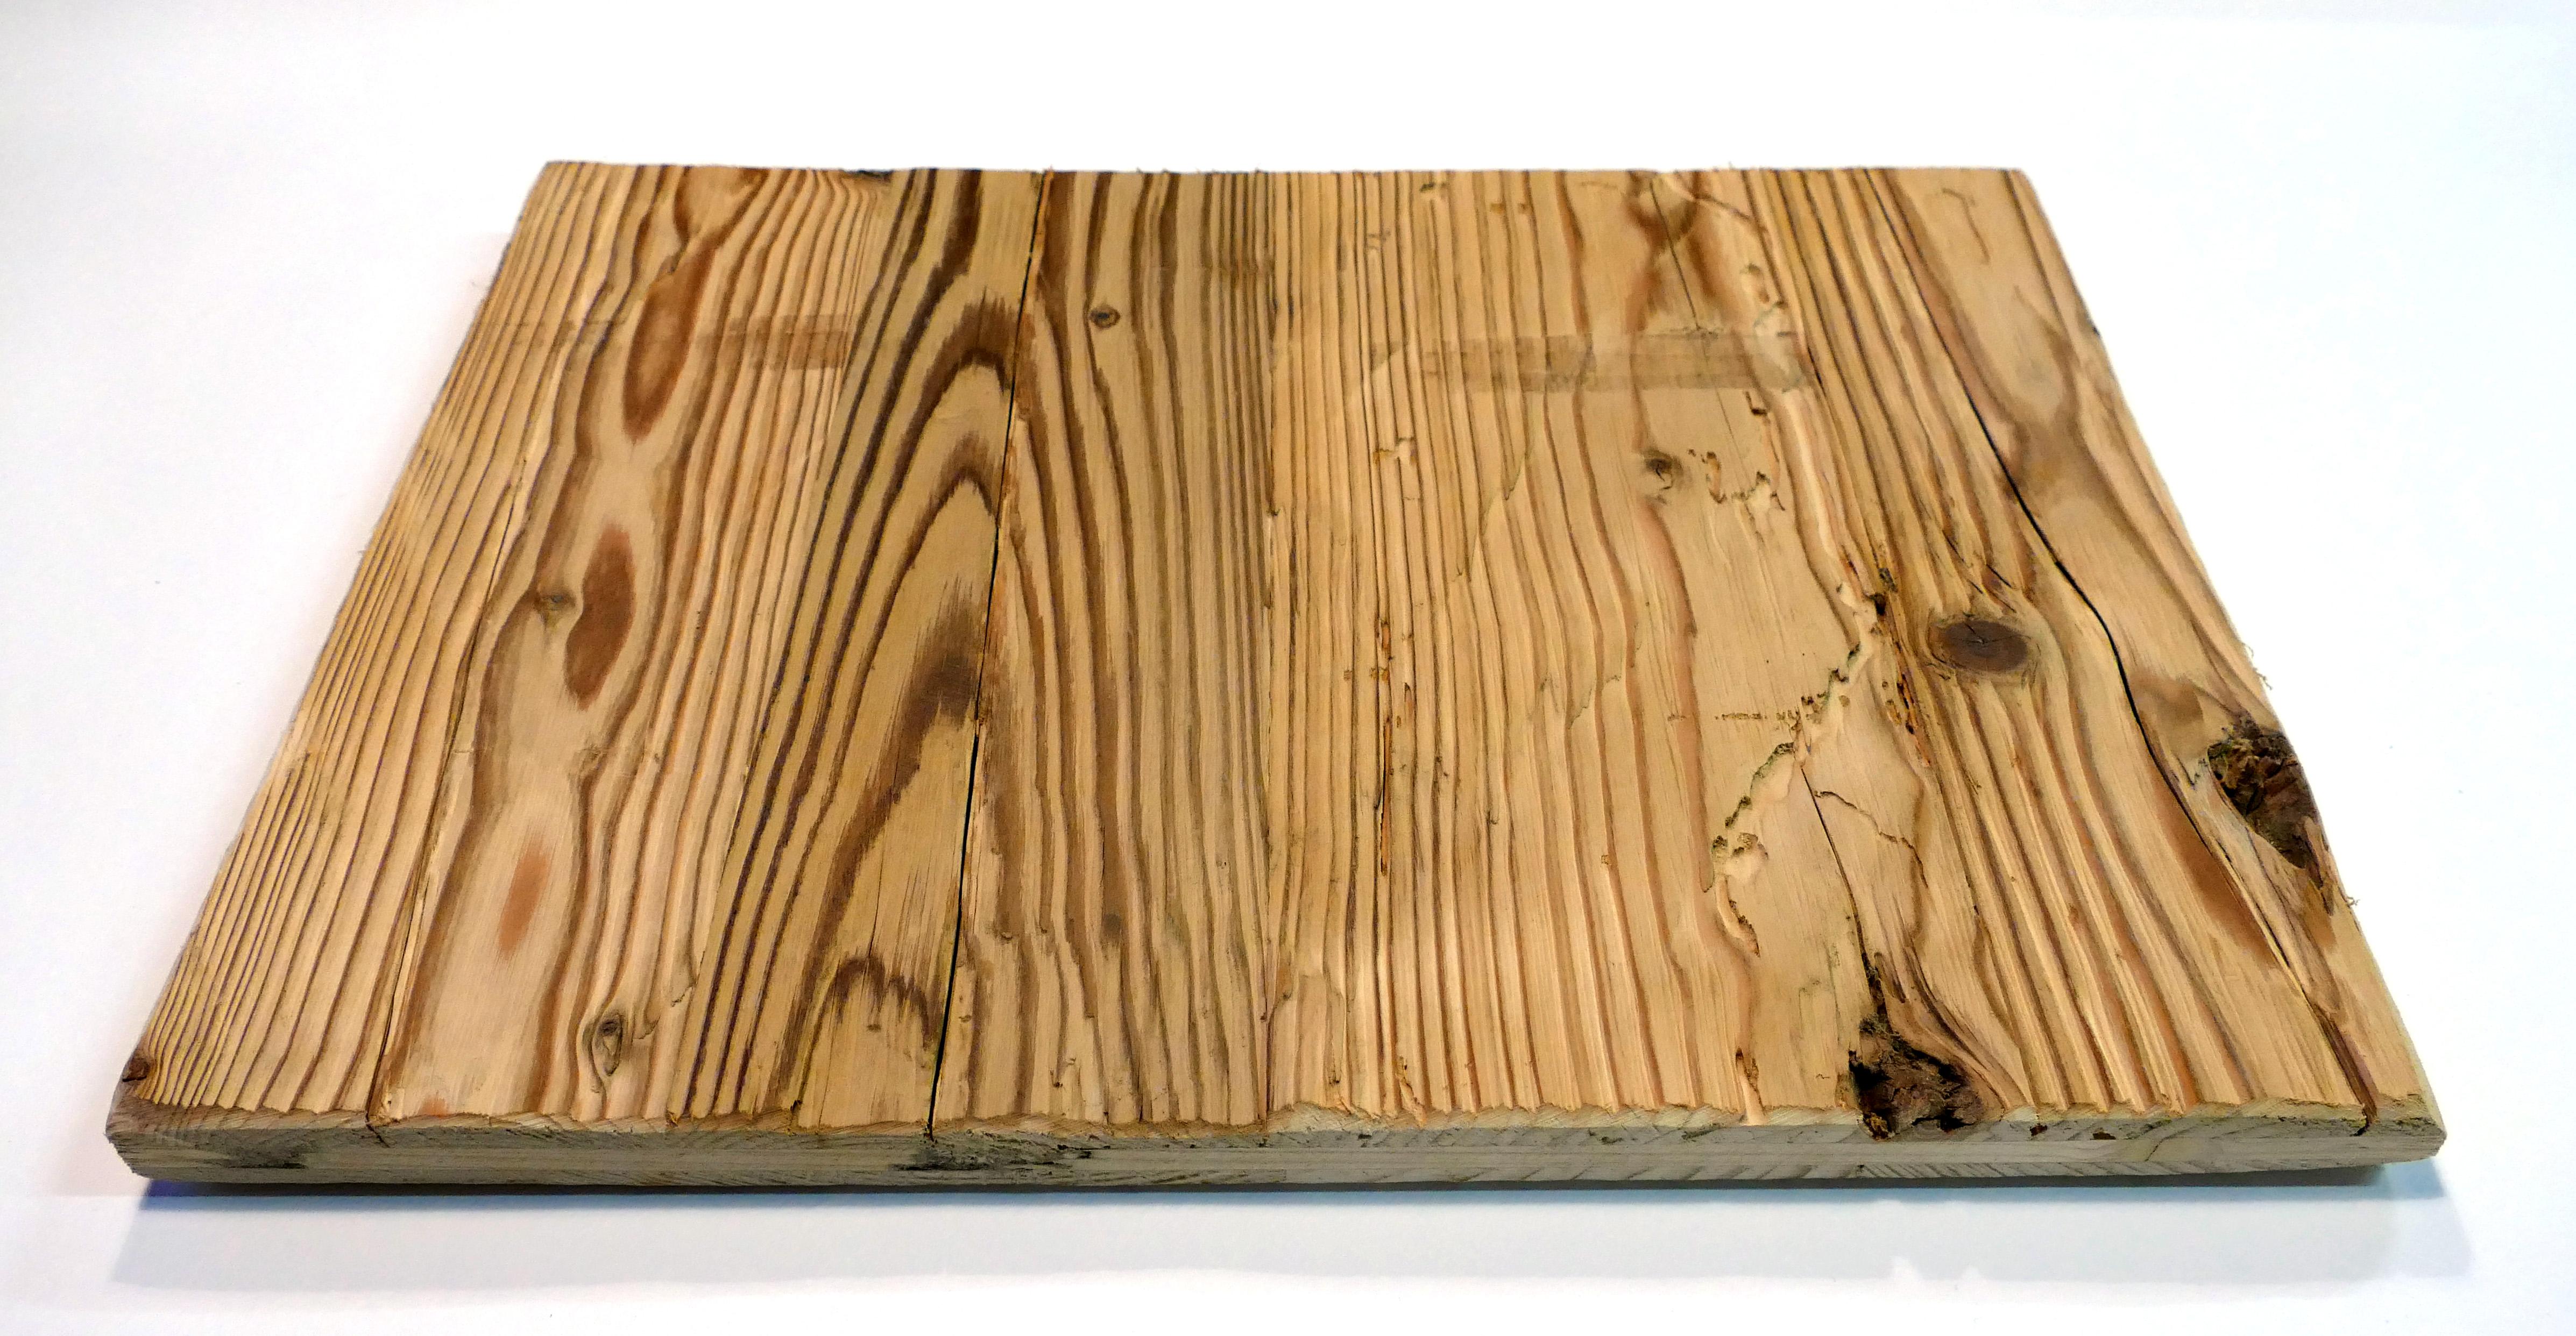 Altholz / Leimholzplatten 3-Schichtplatte mit gehackter Oberfläche